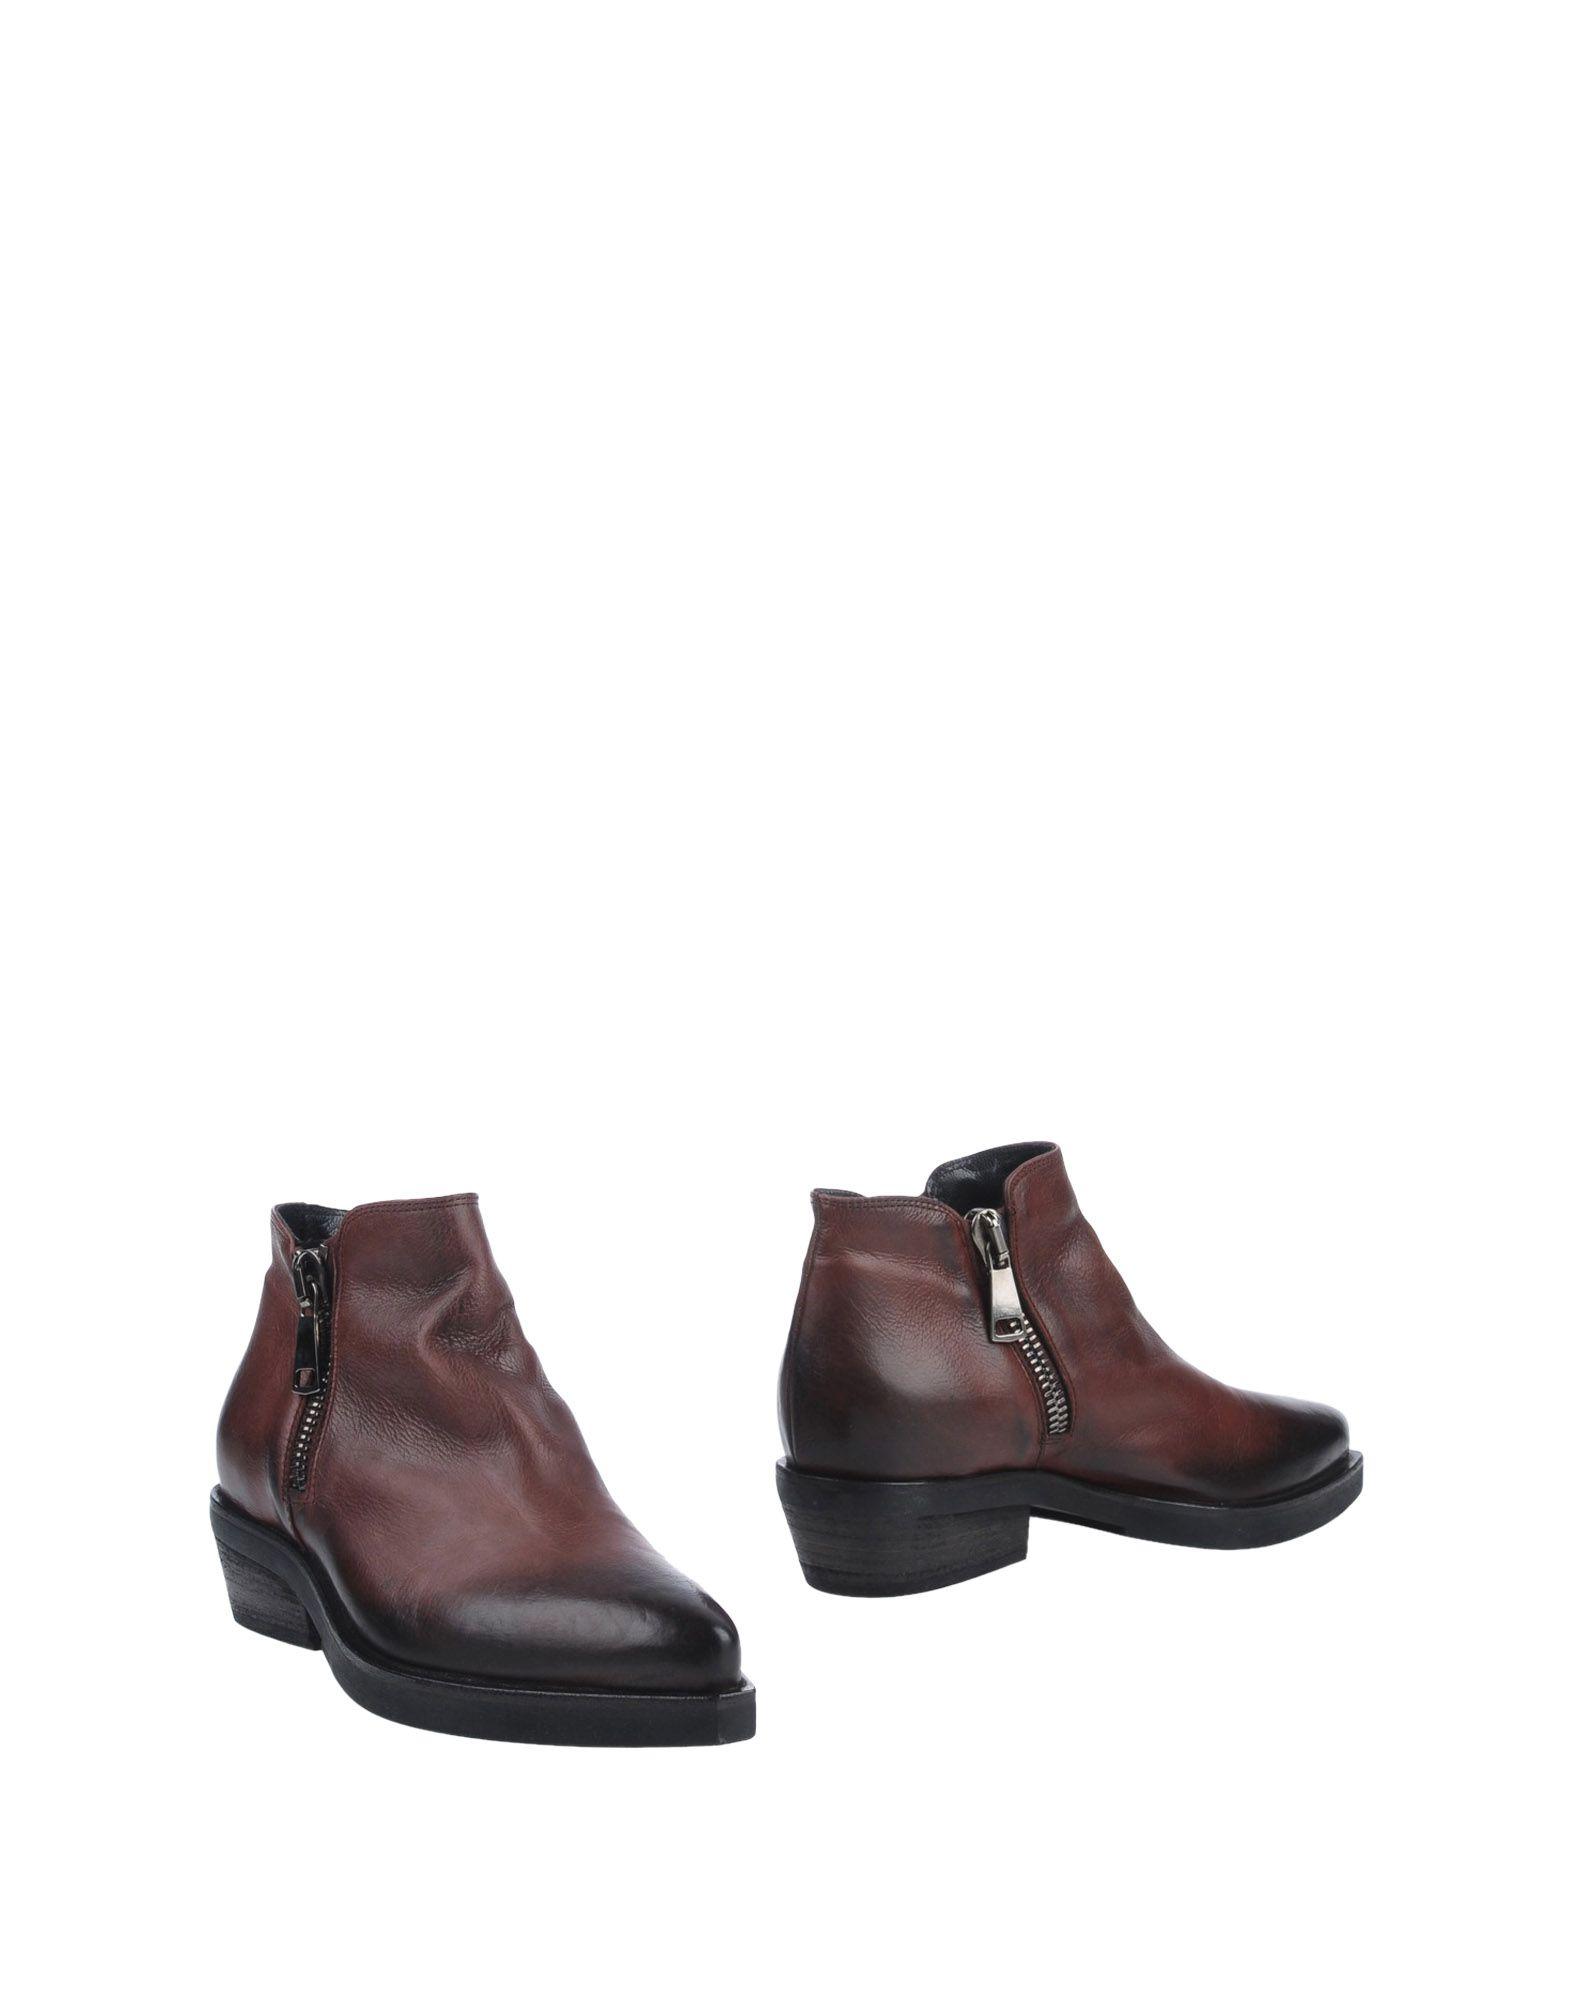 Jfk Jfk Jfk Stiefelette Damen  11310407VW Gute Qualität beliebte Schuhe 5d795a